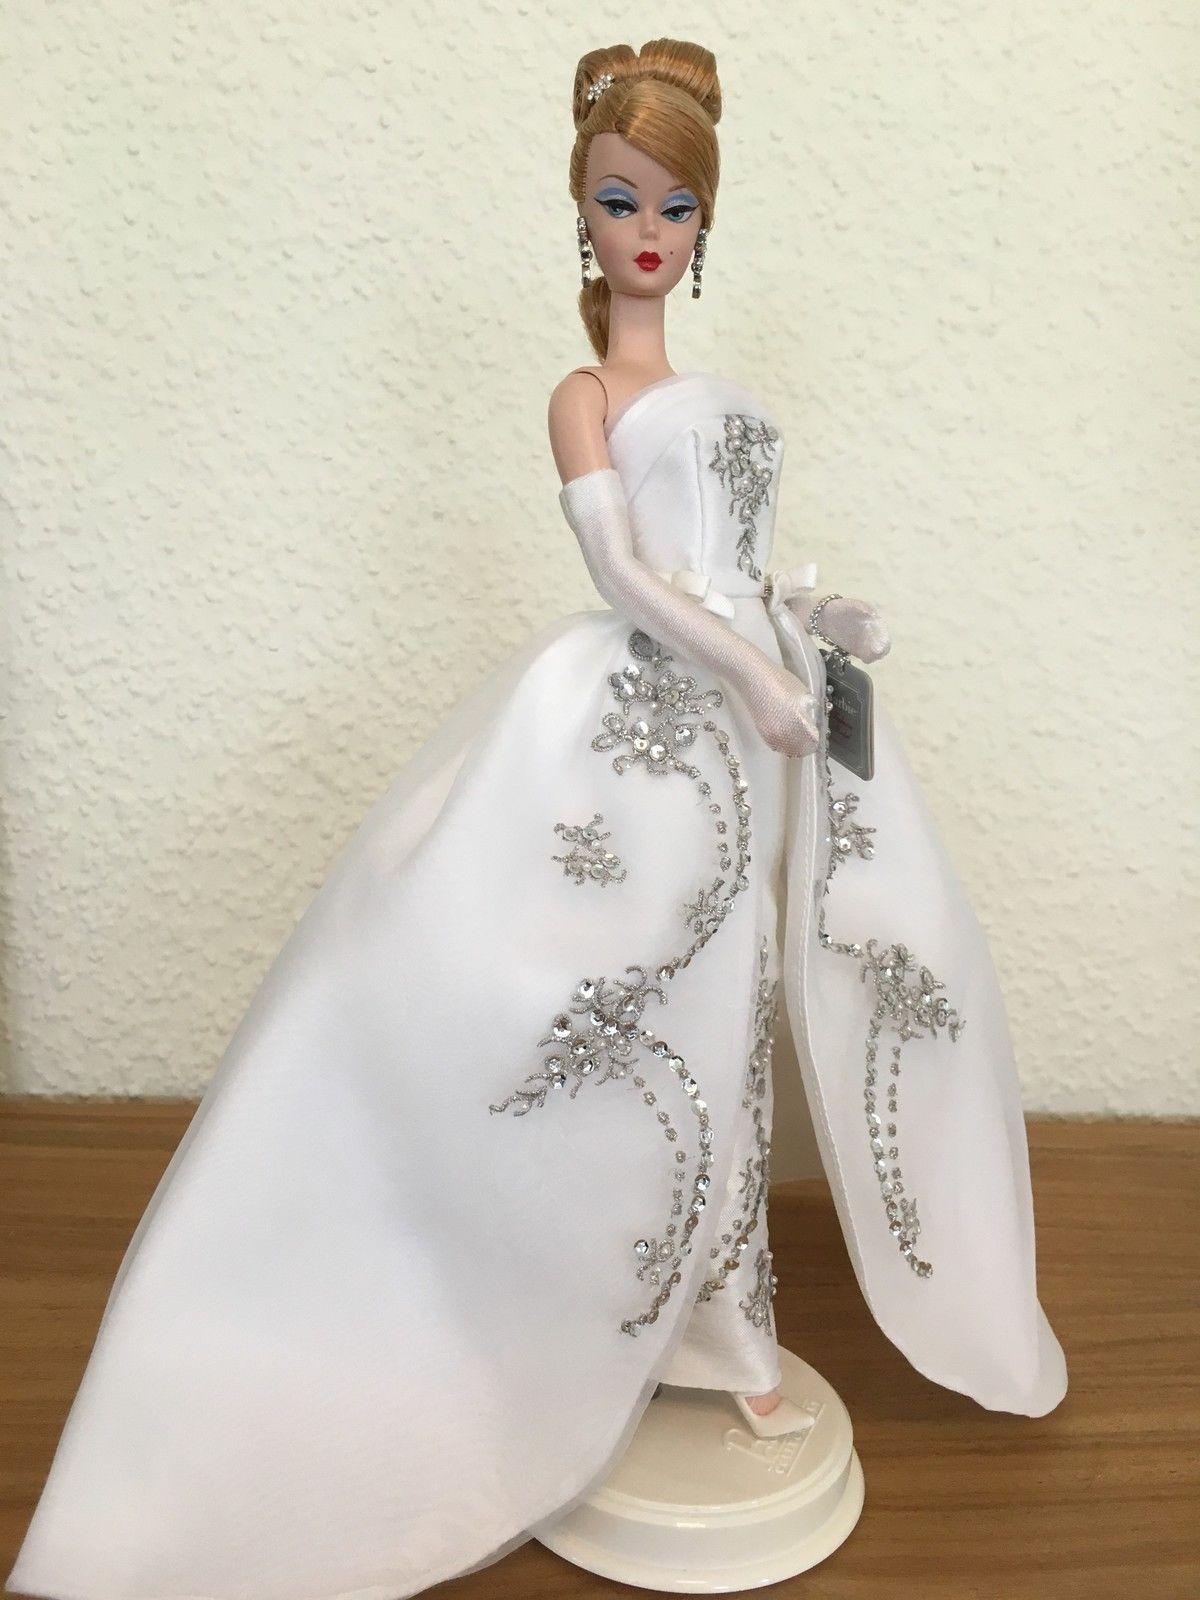 Silkstone Barbie Joyeux, aus dem Jahre 2003, Limited Edition | eBay ...